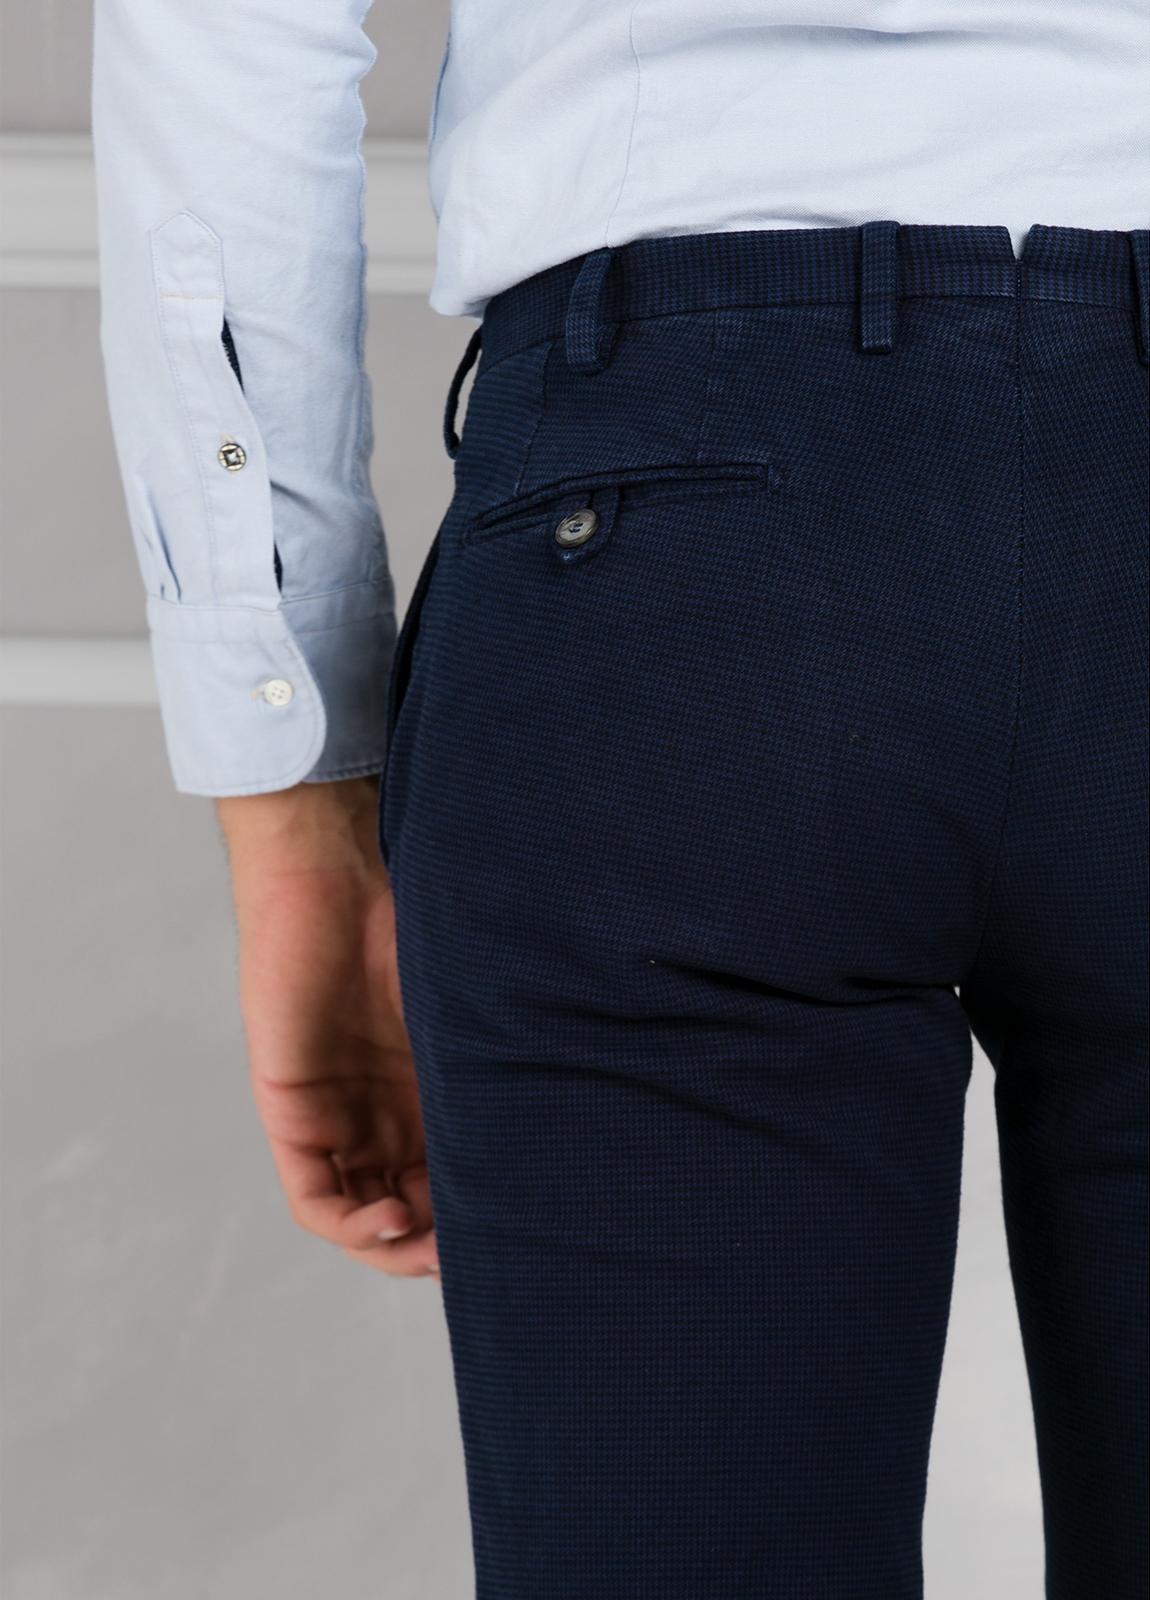 Pantalón sport pata de gallo slim fit color azul marino. 98% Algodón 2% Elastano. - Ítem2